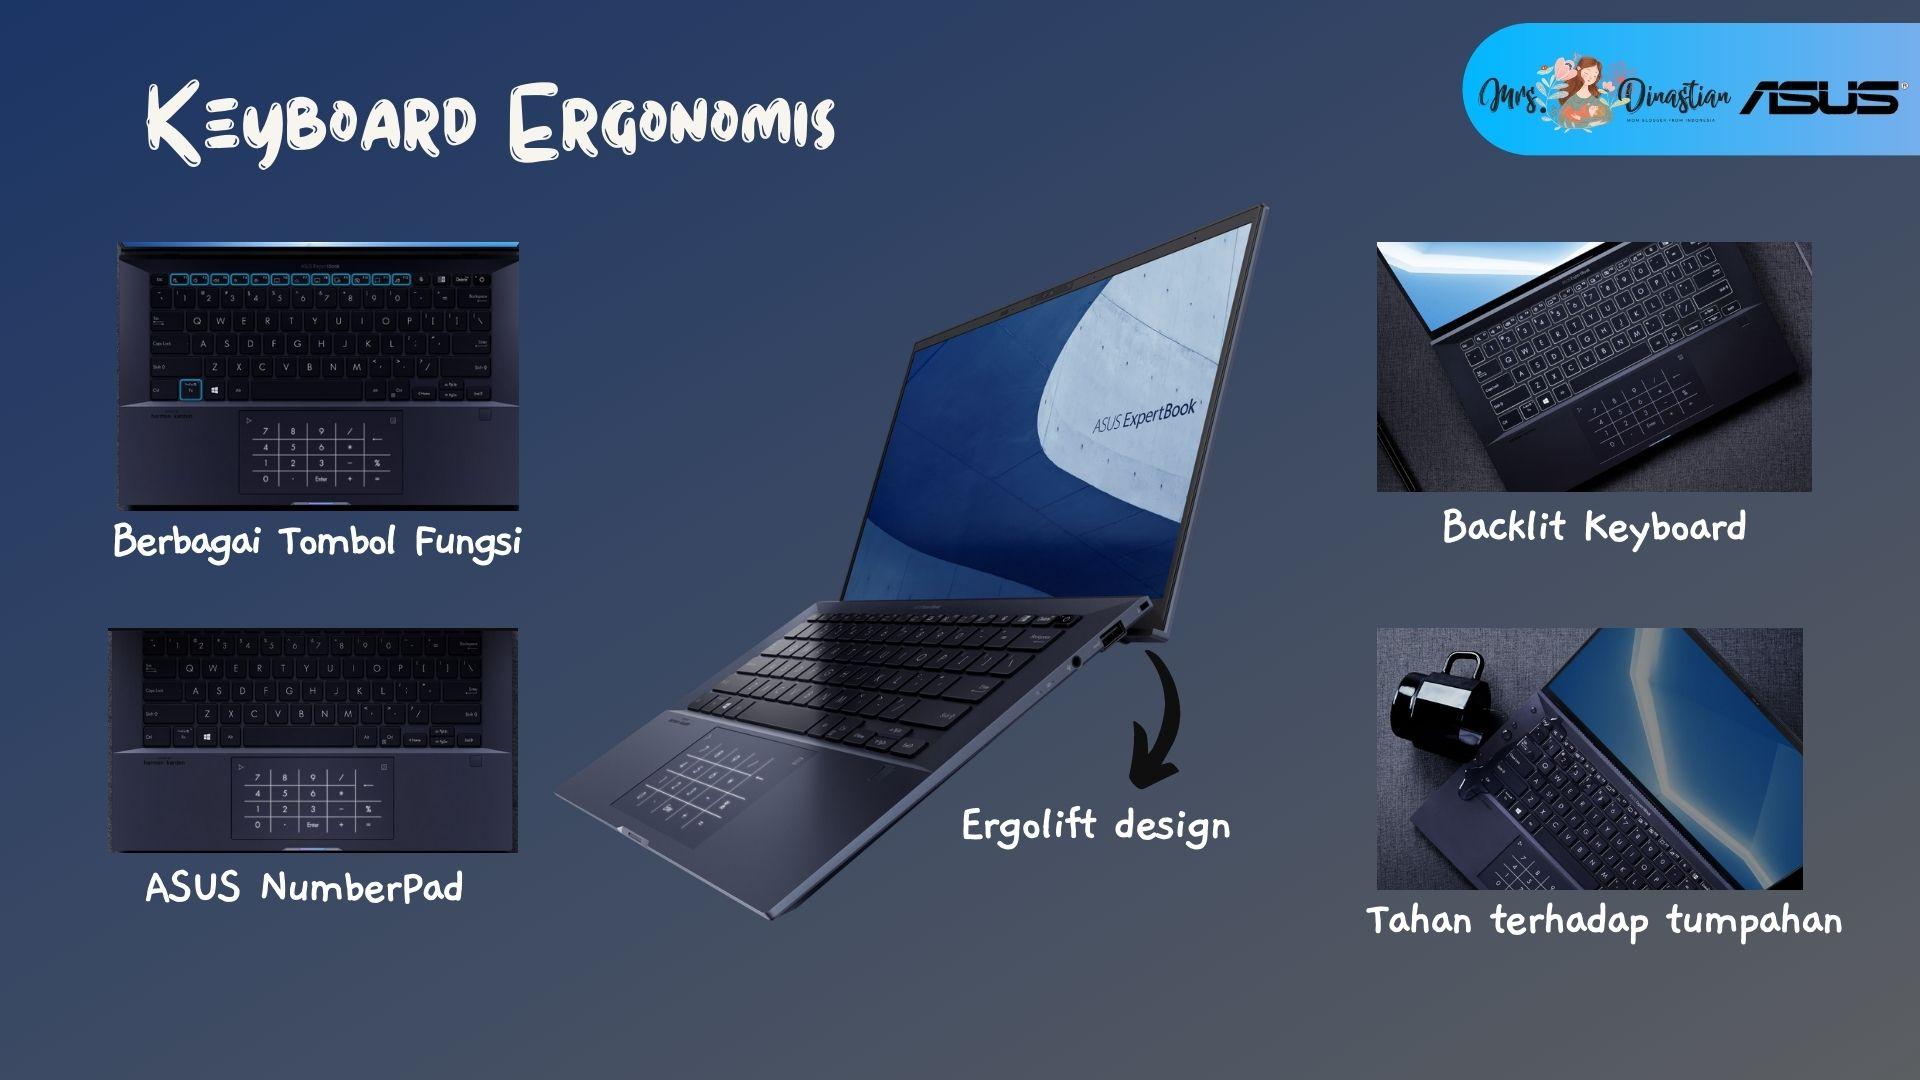 Keyboard ASUS ExpertBook B9400